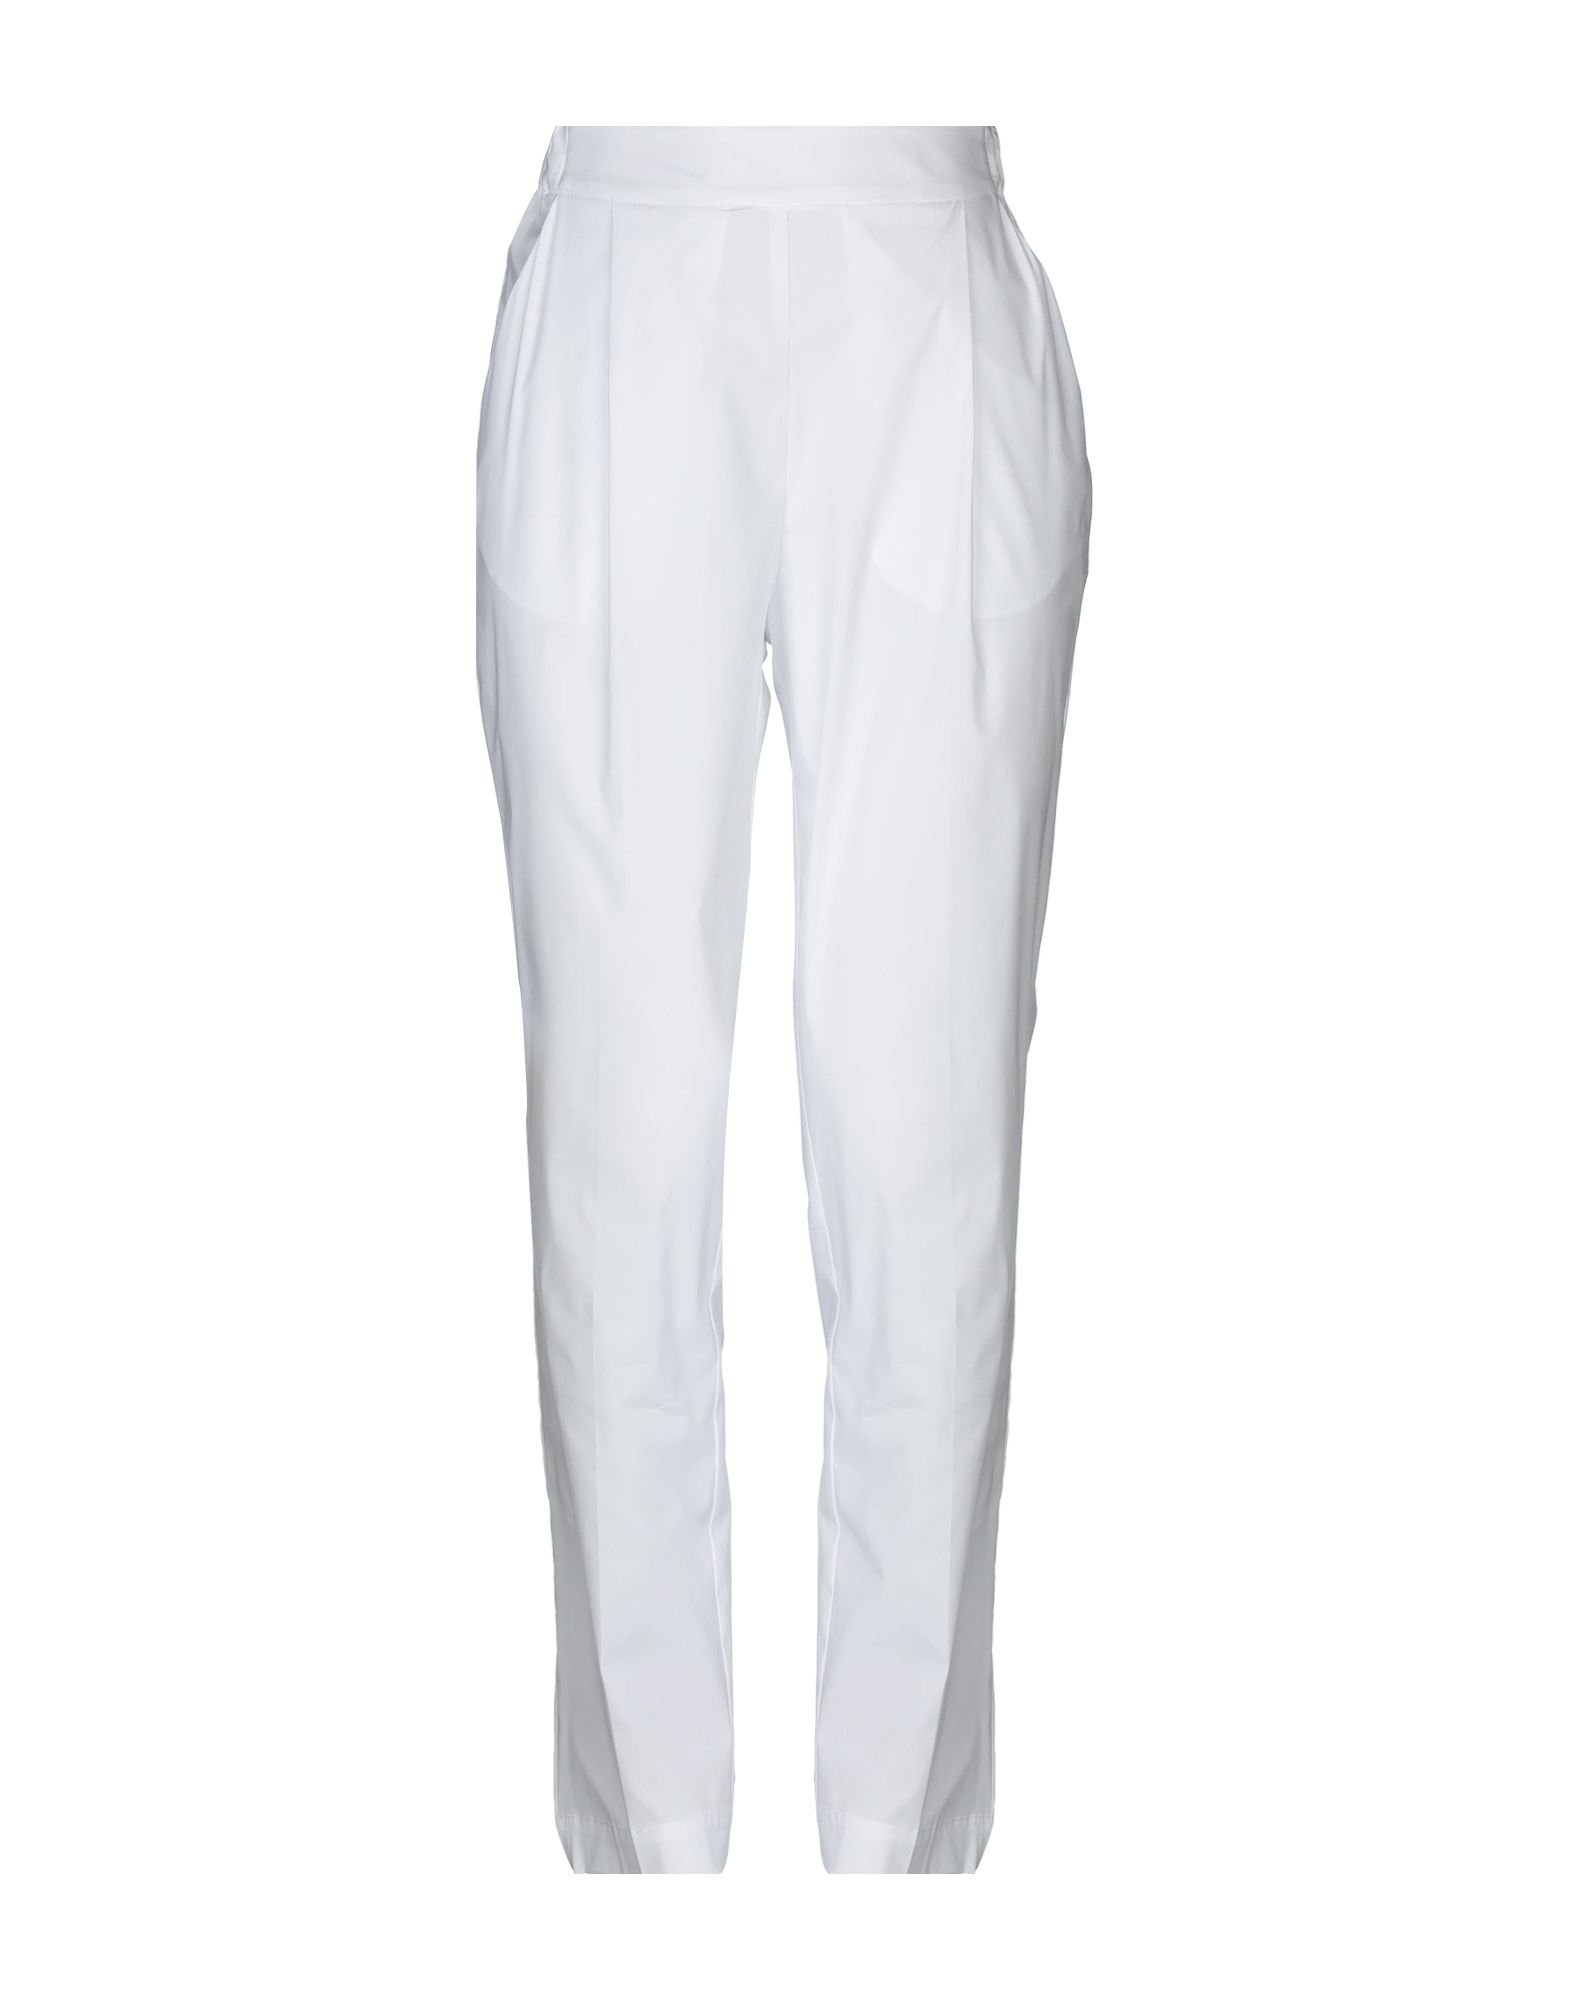 LIVIANA CONTI Повседневные брюки liviana conti повседневные брюки